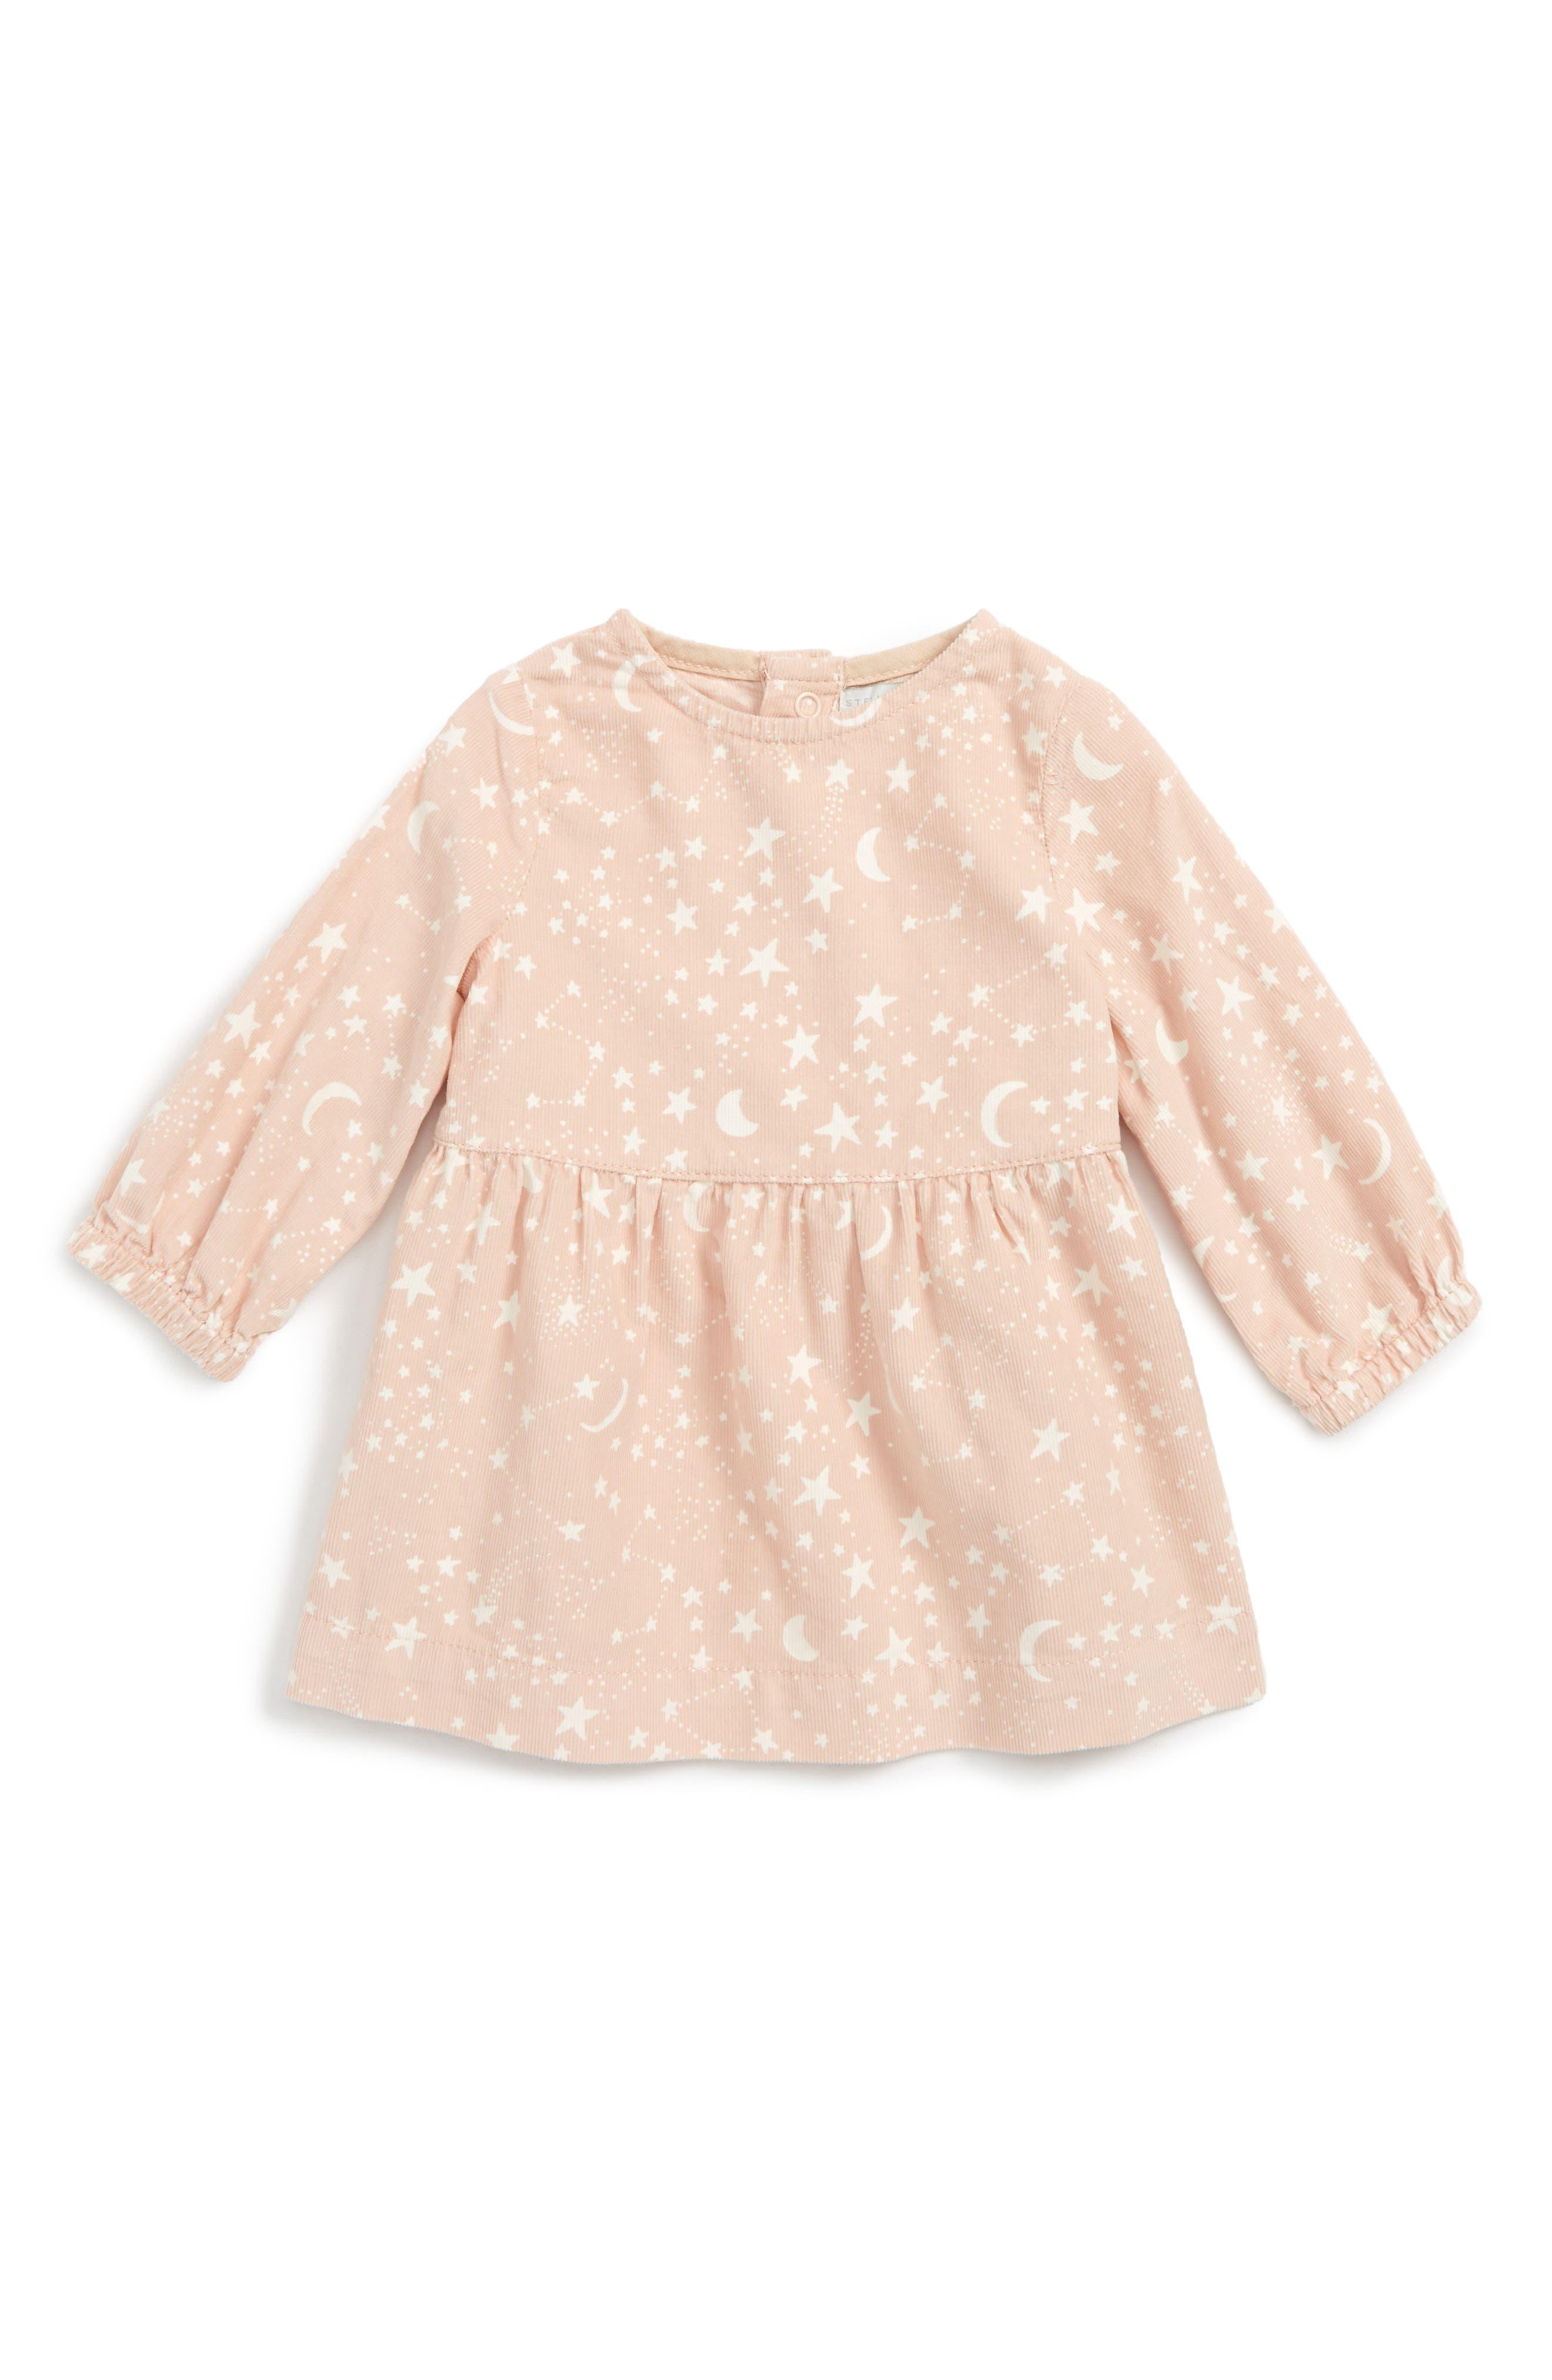 Main Image - Stella McCartney Kids Skippy Star Print Dress (Baby Girls)